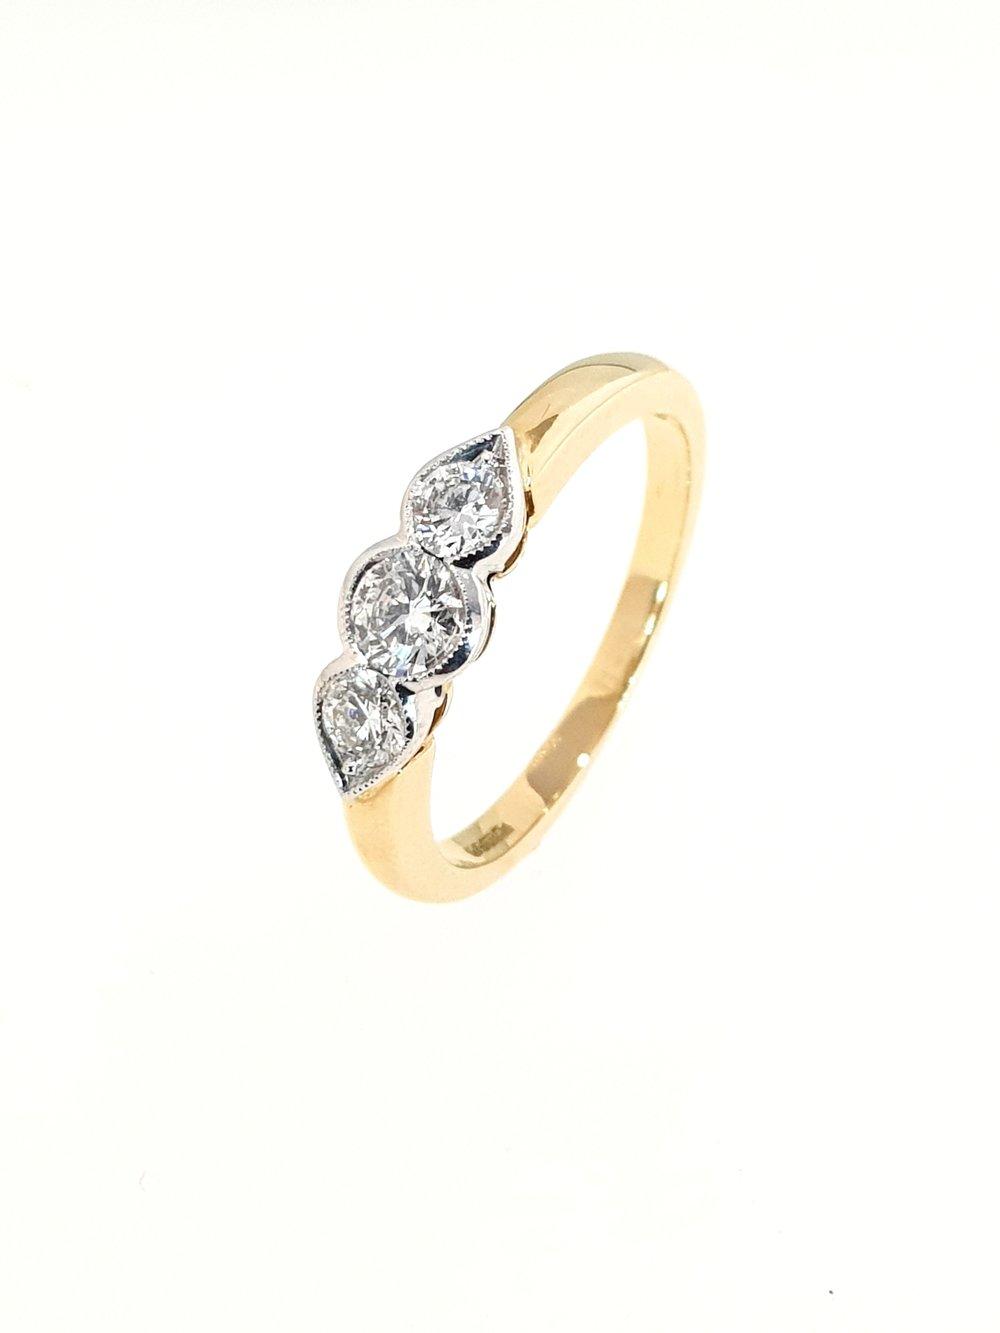 3 Stone Diamond Ring in Yellow Gold  .50ct, G, Si1  Stock Code: N8979  £1850